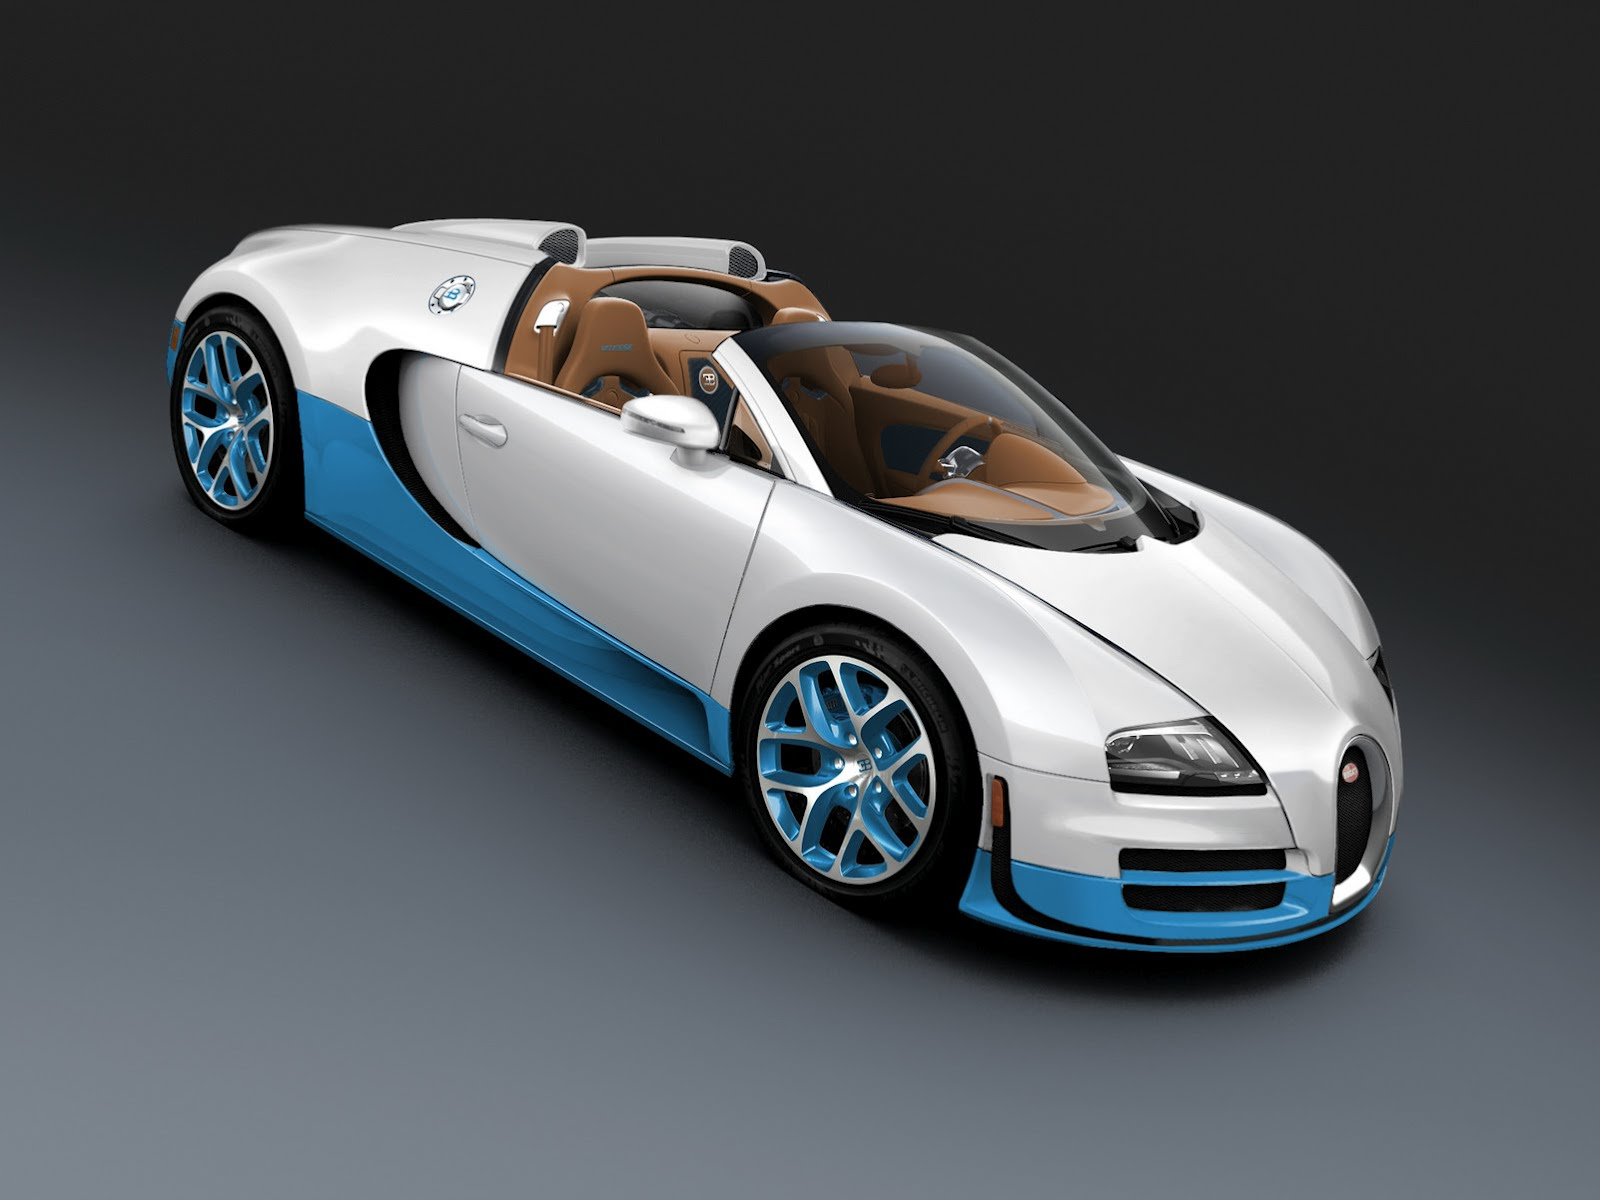 bugatti veyron grand sport vitesse special edition. Black Bedroom Furniture Sets. Home Design Ideas